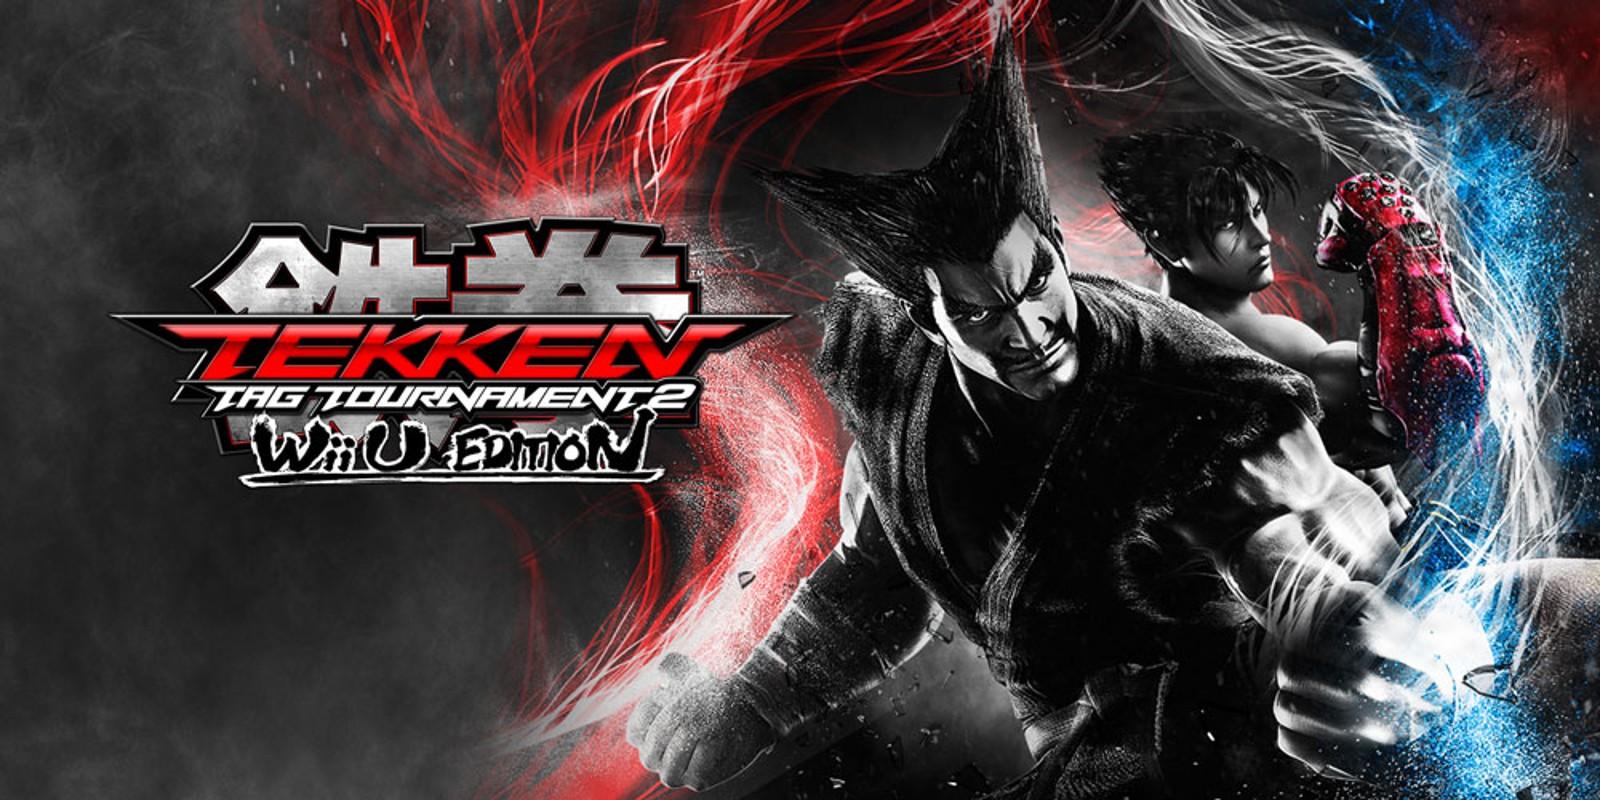 Super Metroid Hd Wallpaper Tekken Tag Tournament 2 Wii U Edition Wii U Games